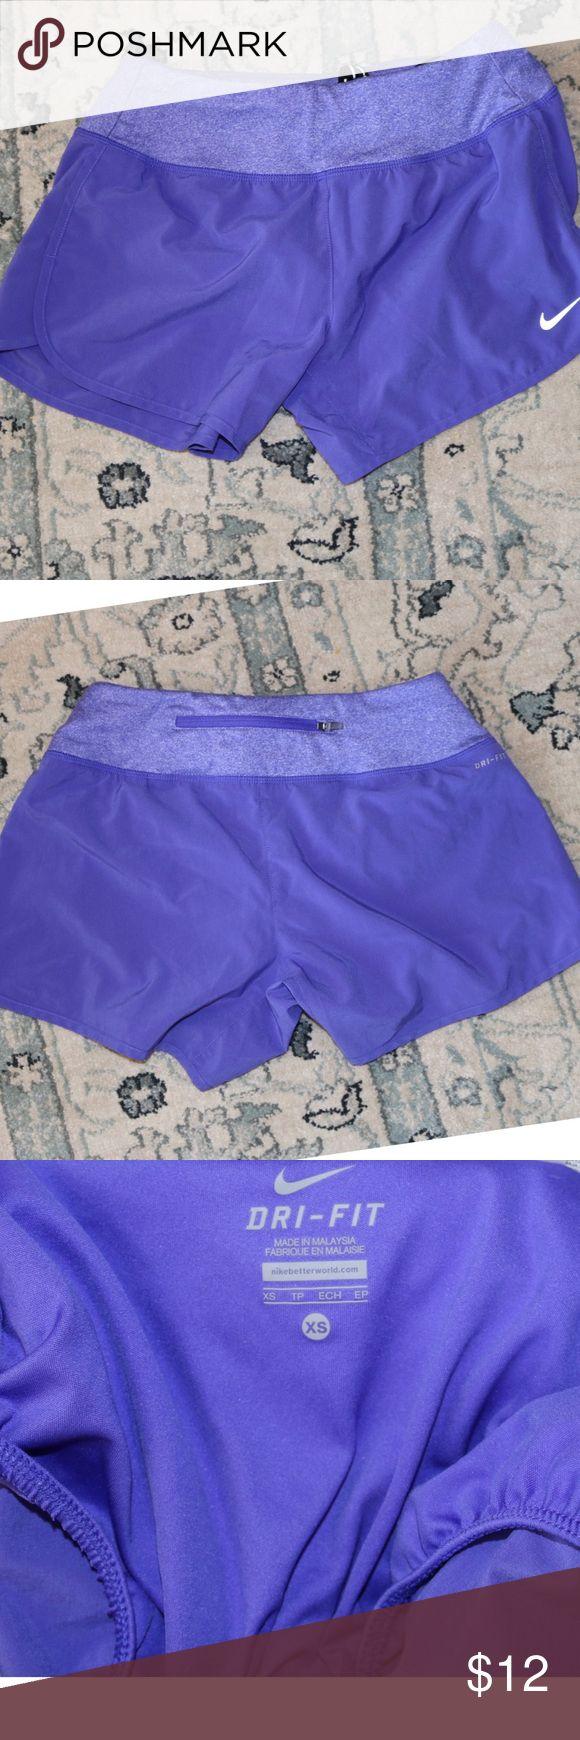 NIKE Dri Fit women's  Purple running shorts XS Nike Dri Fit Running Shorts Purple XS Excellent Condition Nike Shorts